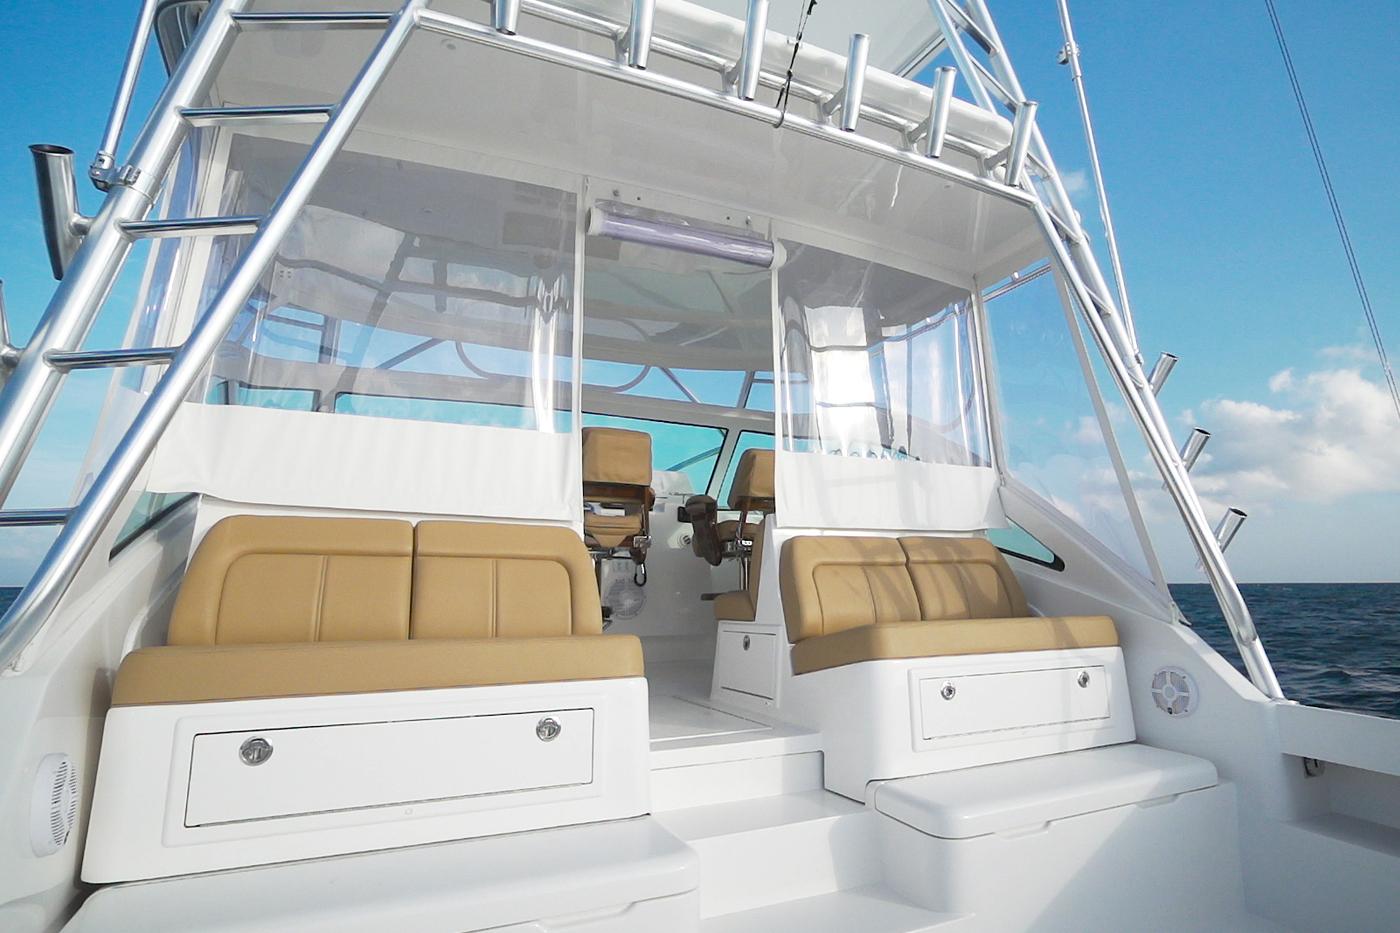 Mezzanine seating on the new Albemarle 41 Express Custom Carolina Edition fishing boat